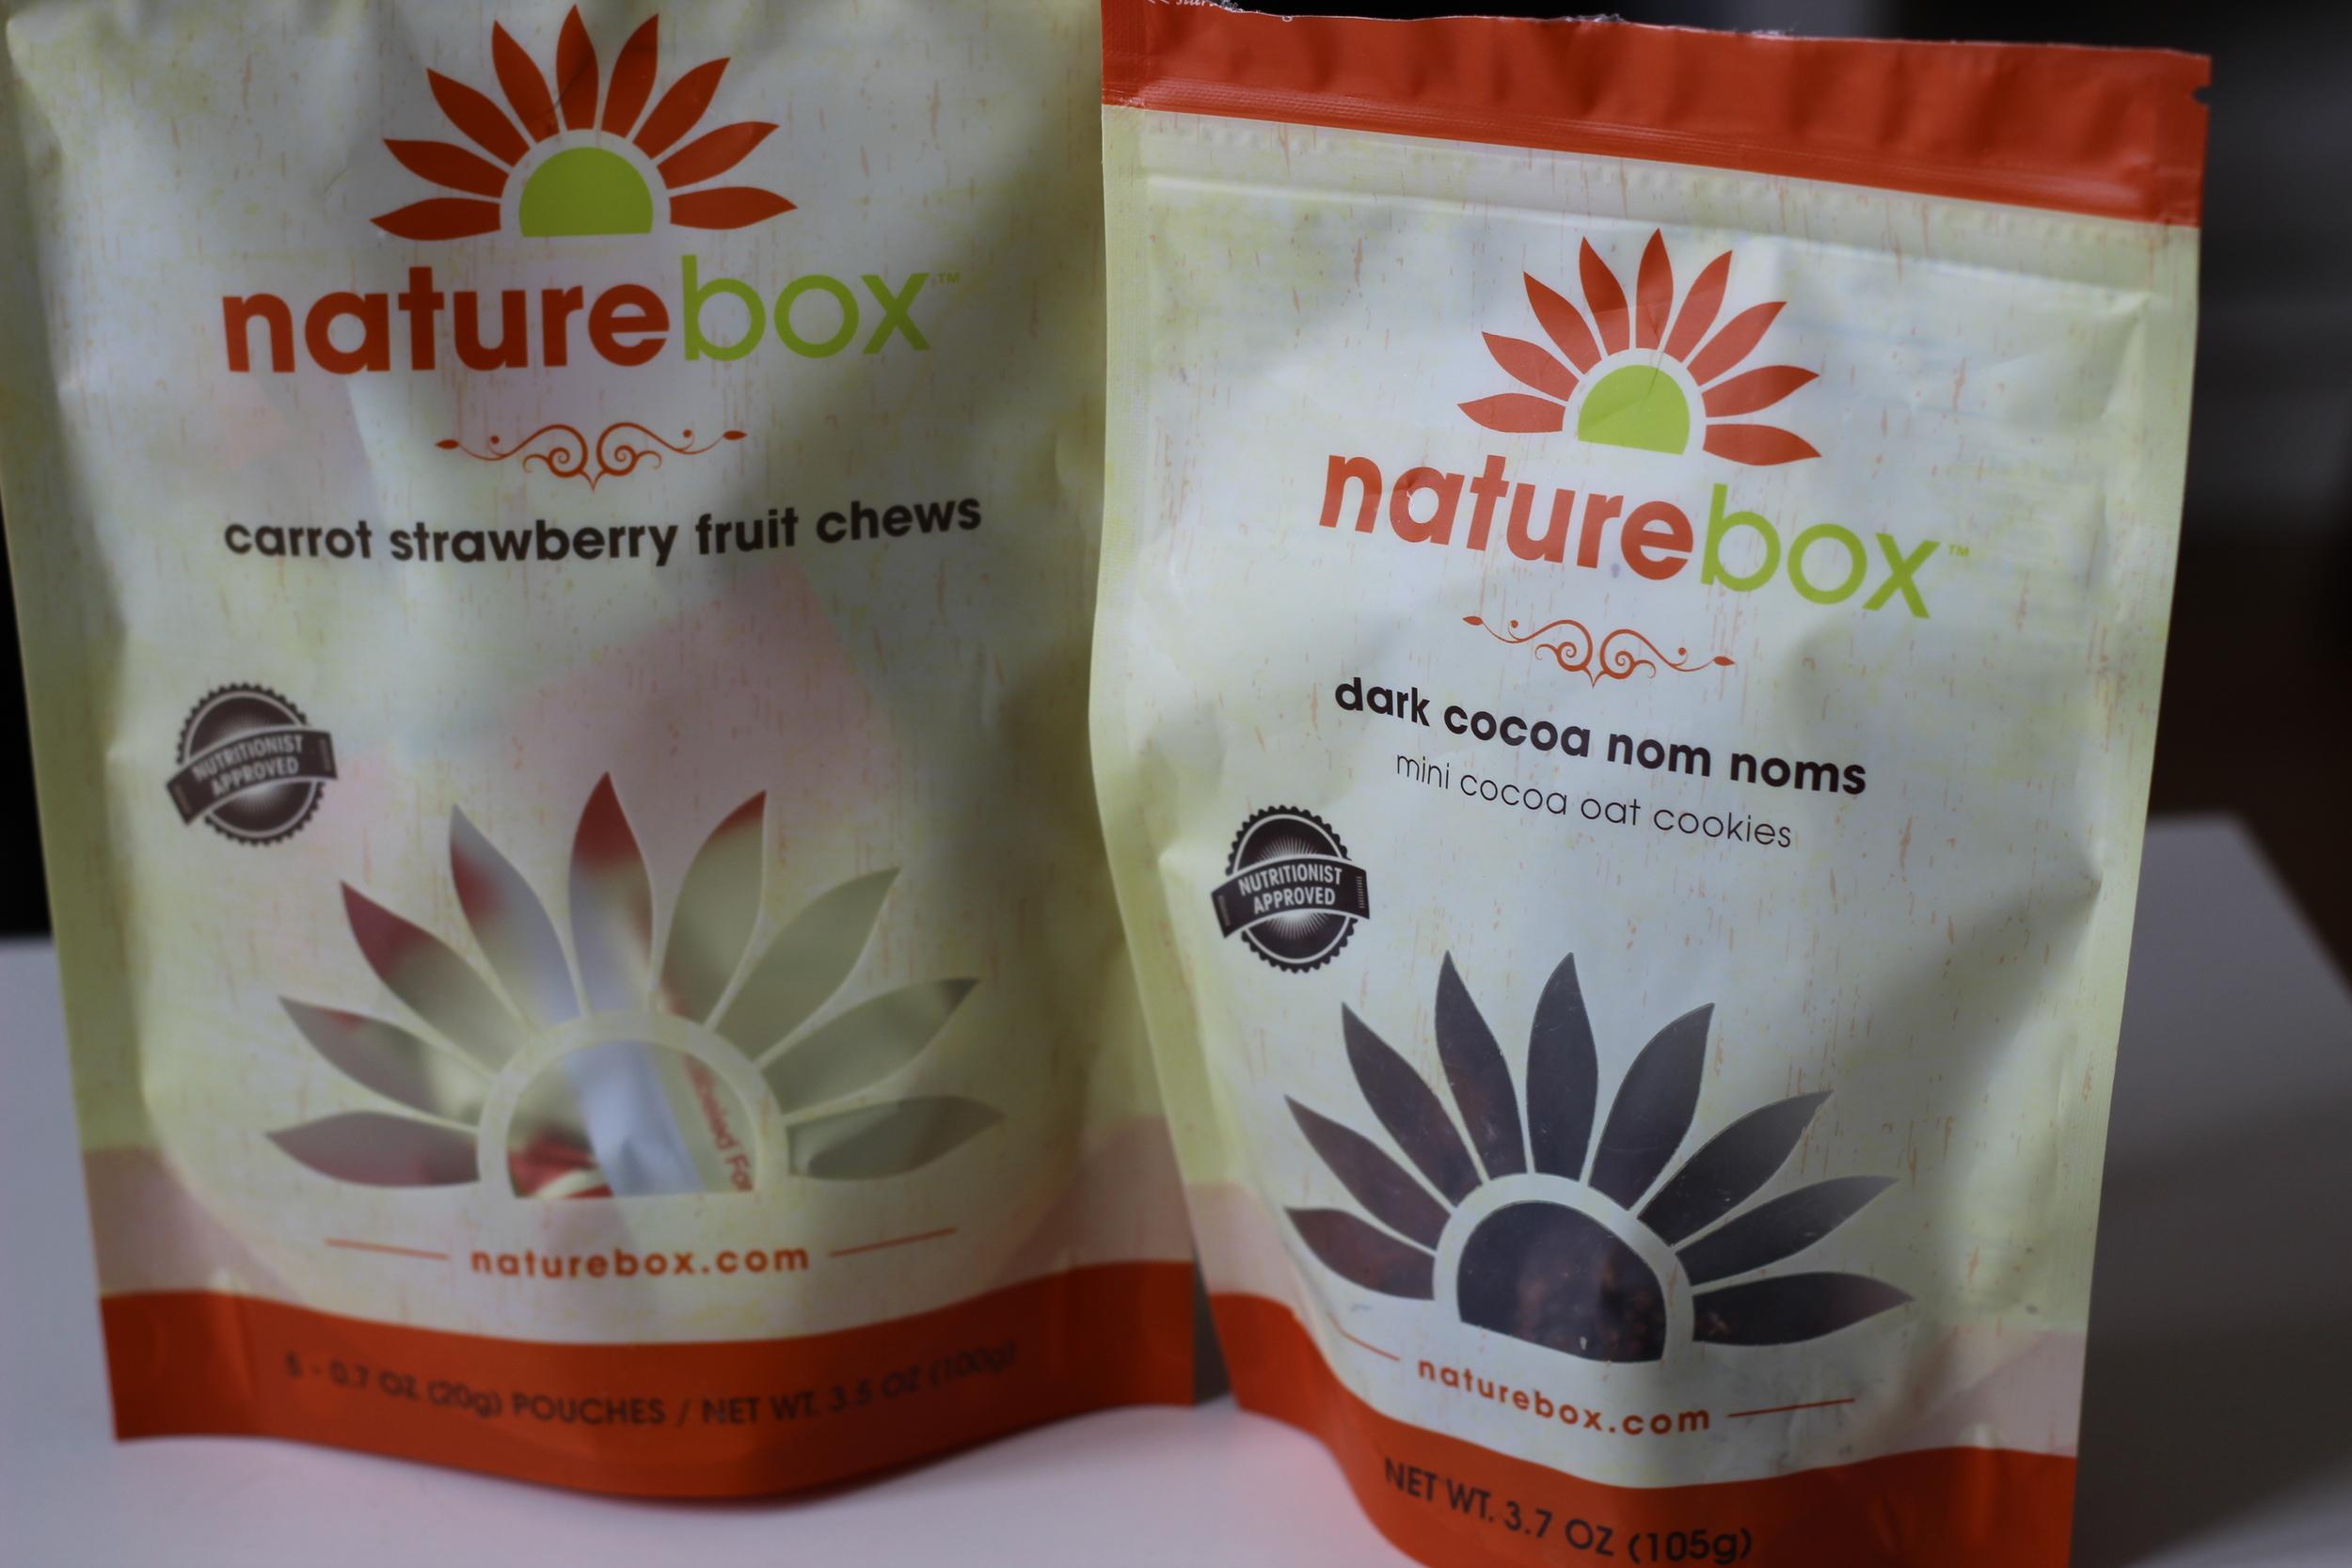 Naturebox Carrot Strawberry Fruit Chews and Dark Cocoa Nom Noms